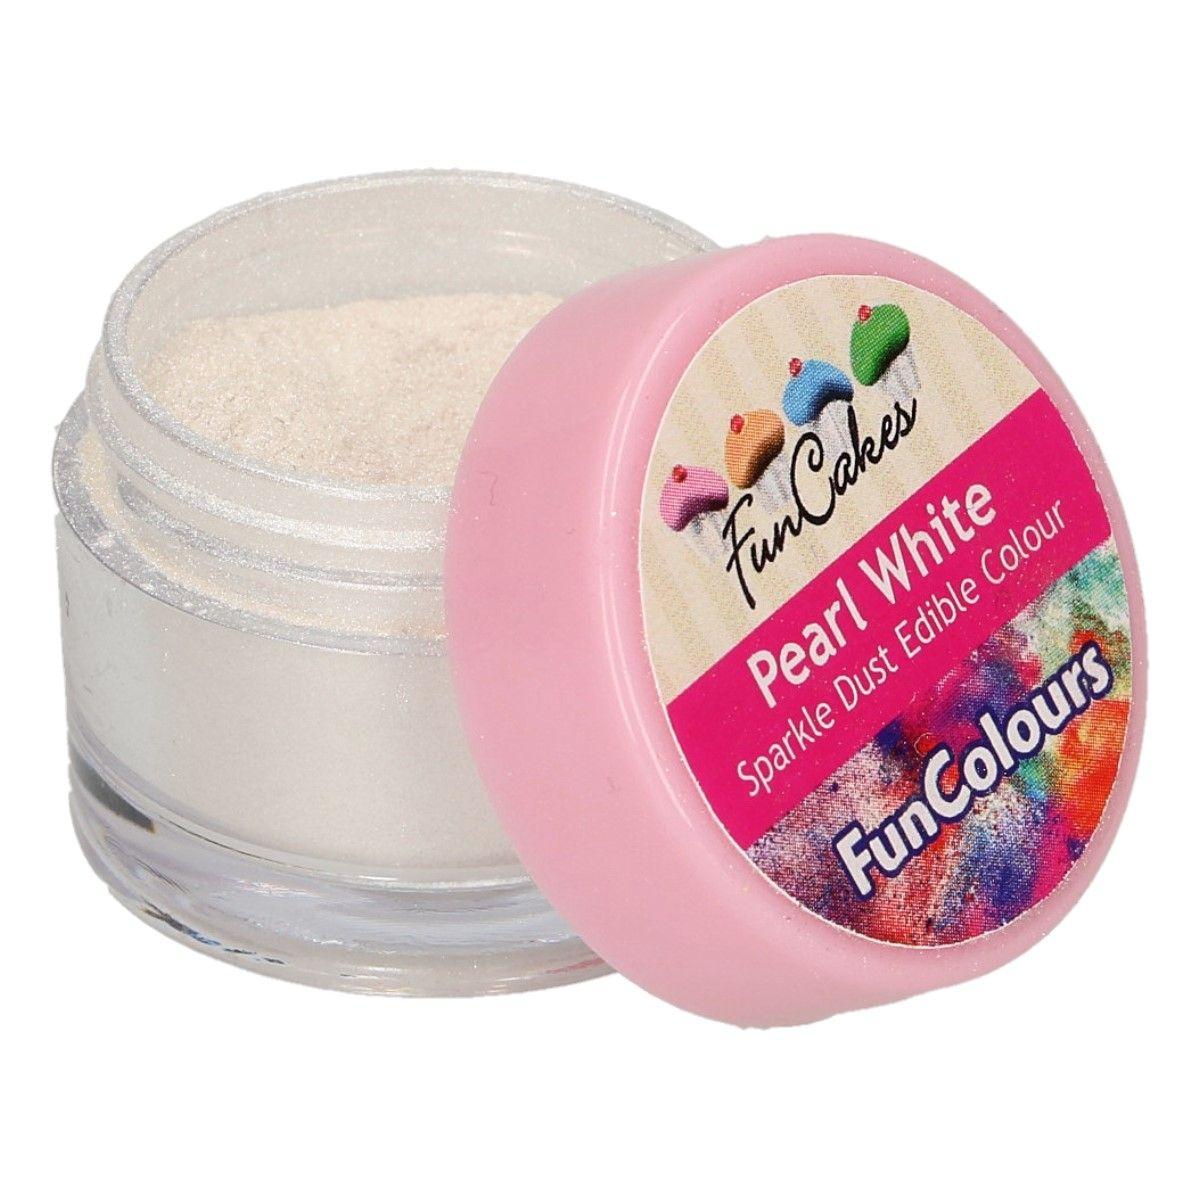 Glitterstaub pearl white